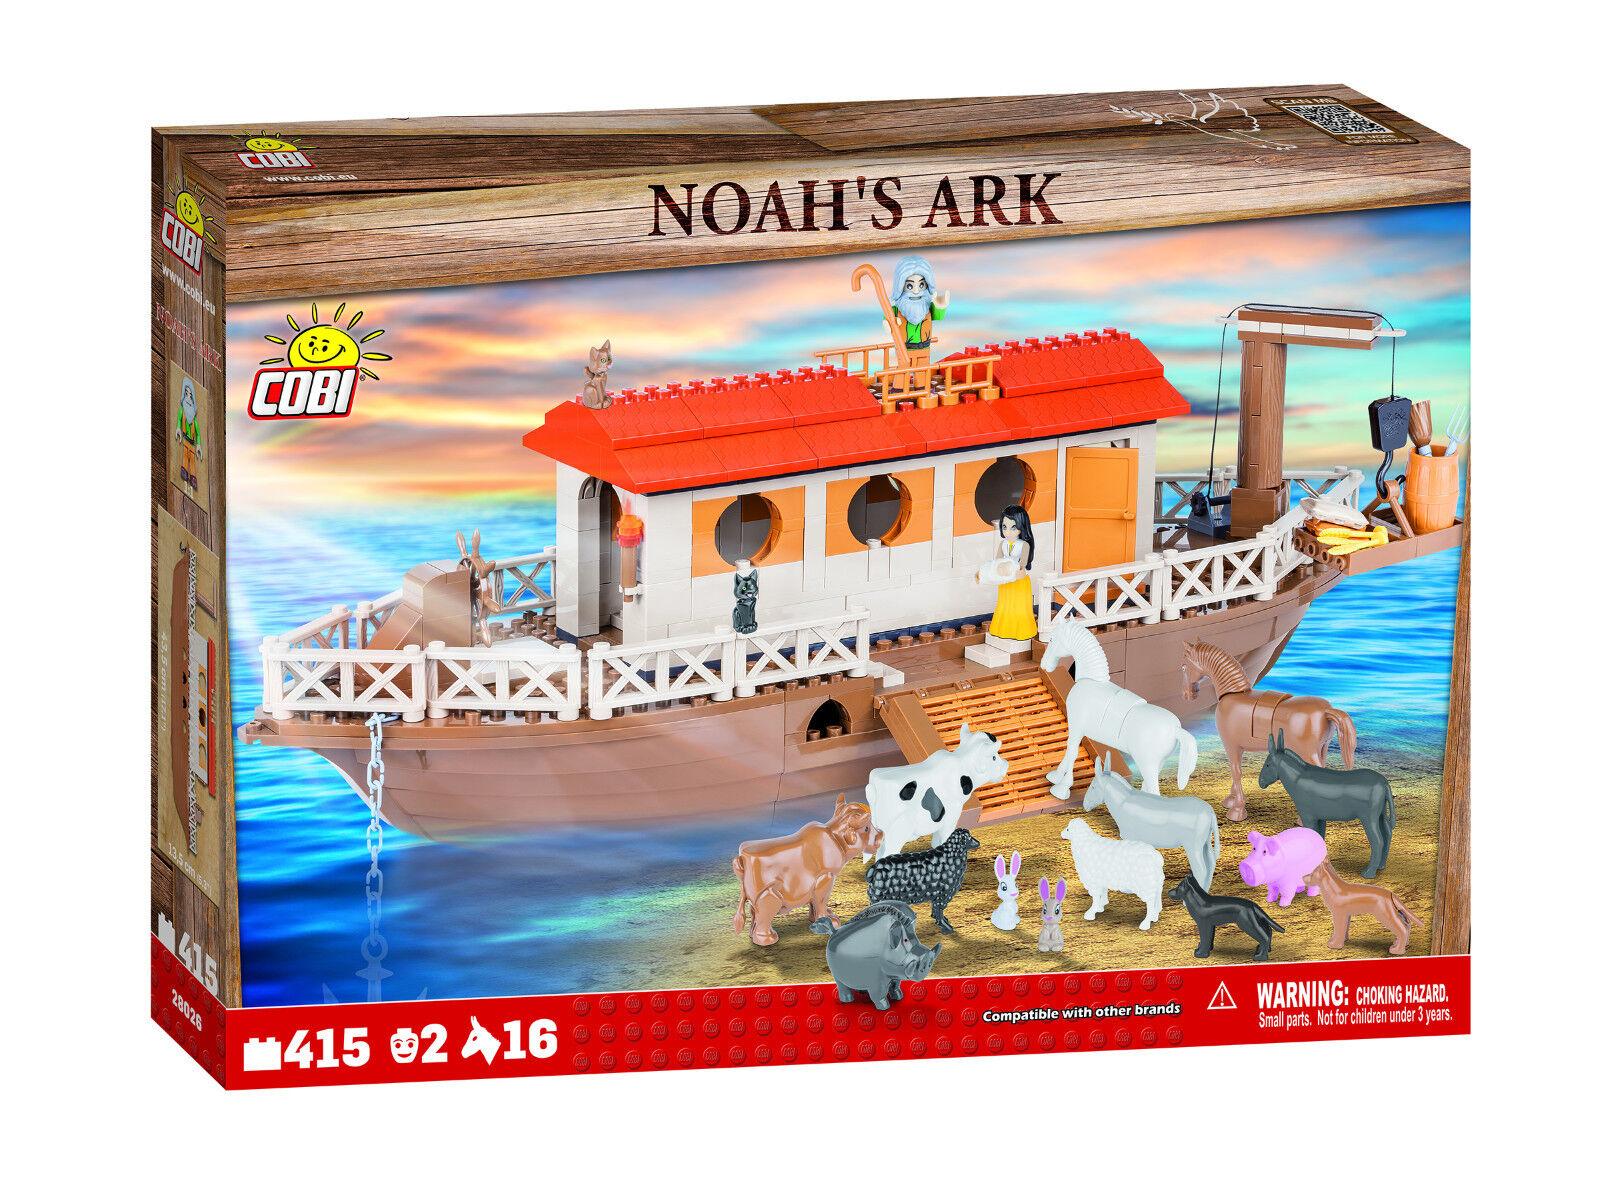 COBI 'Noah's Ark' 415 Pieces 2 Figures & 16 Animals Item